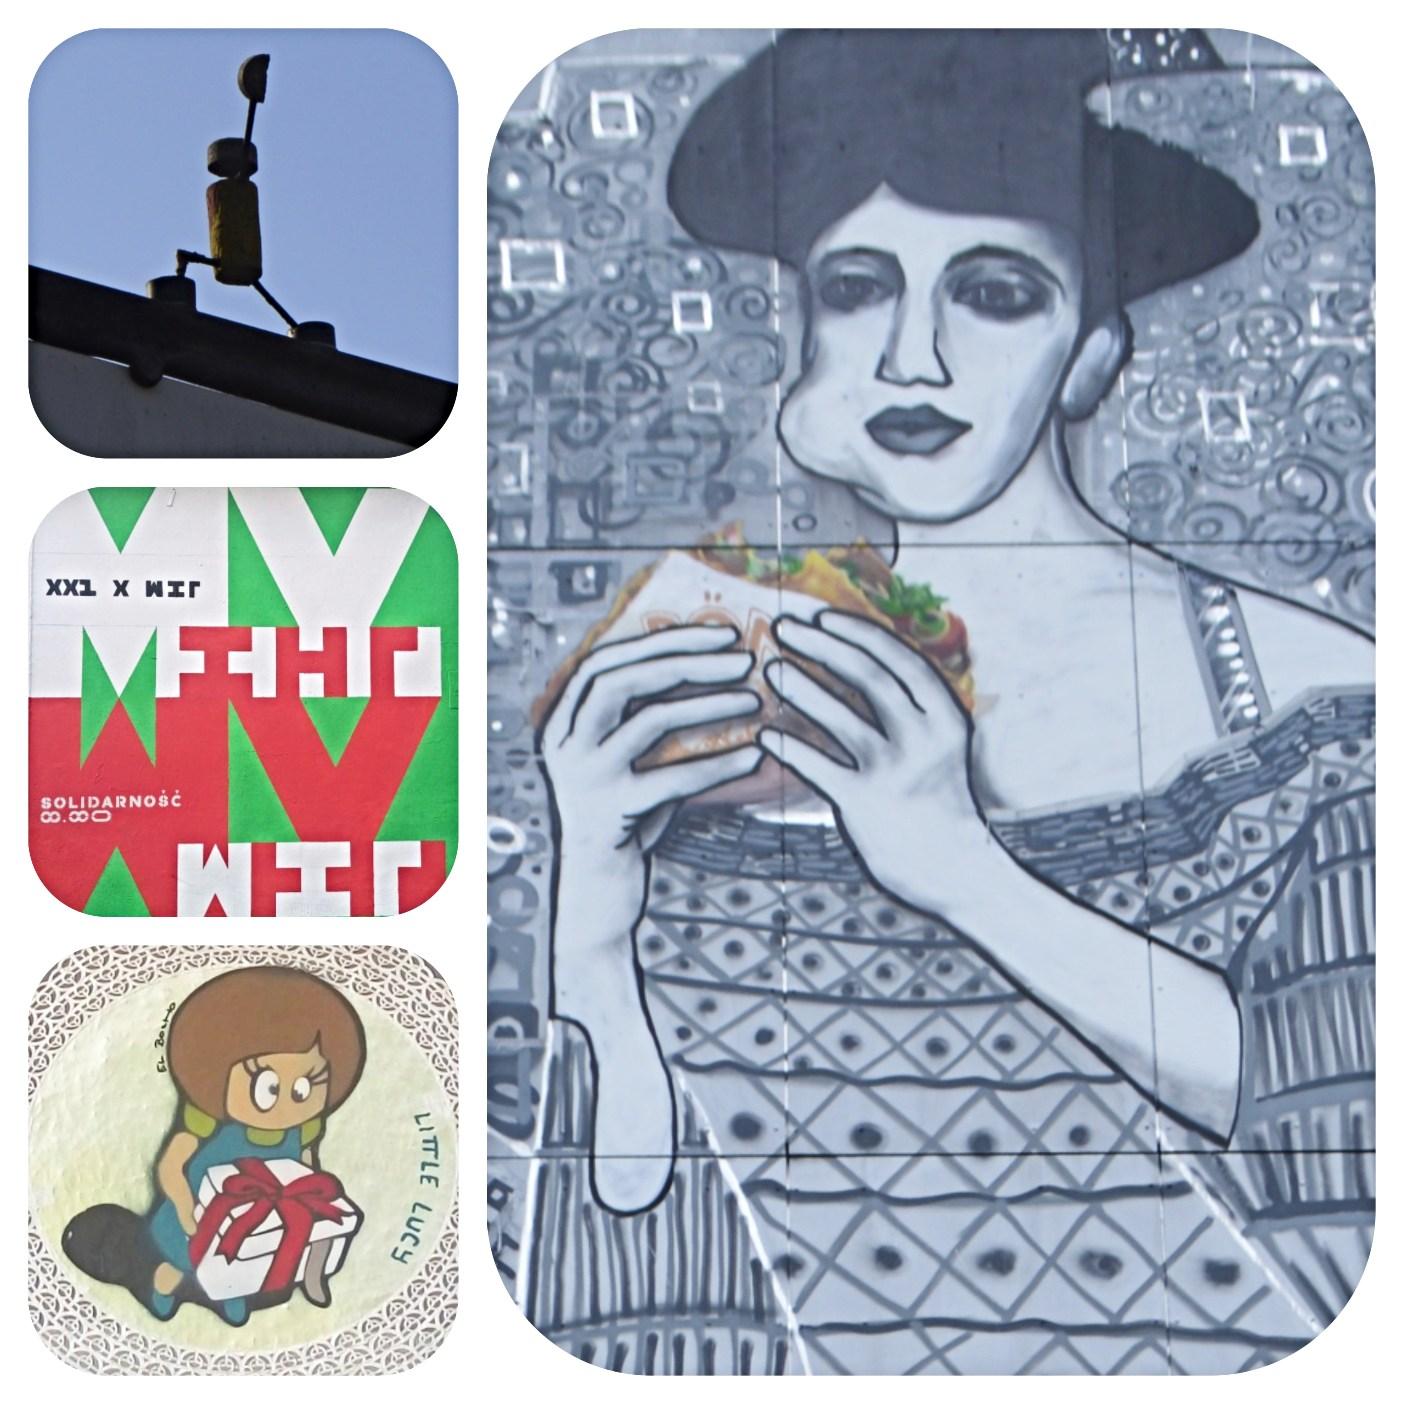 streetart postcards from berlin #20 be kitschig blog